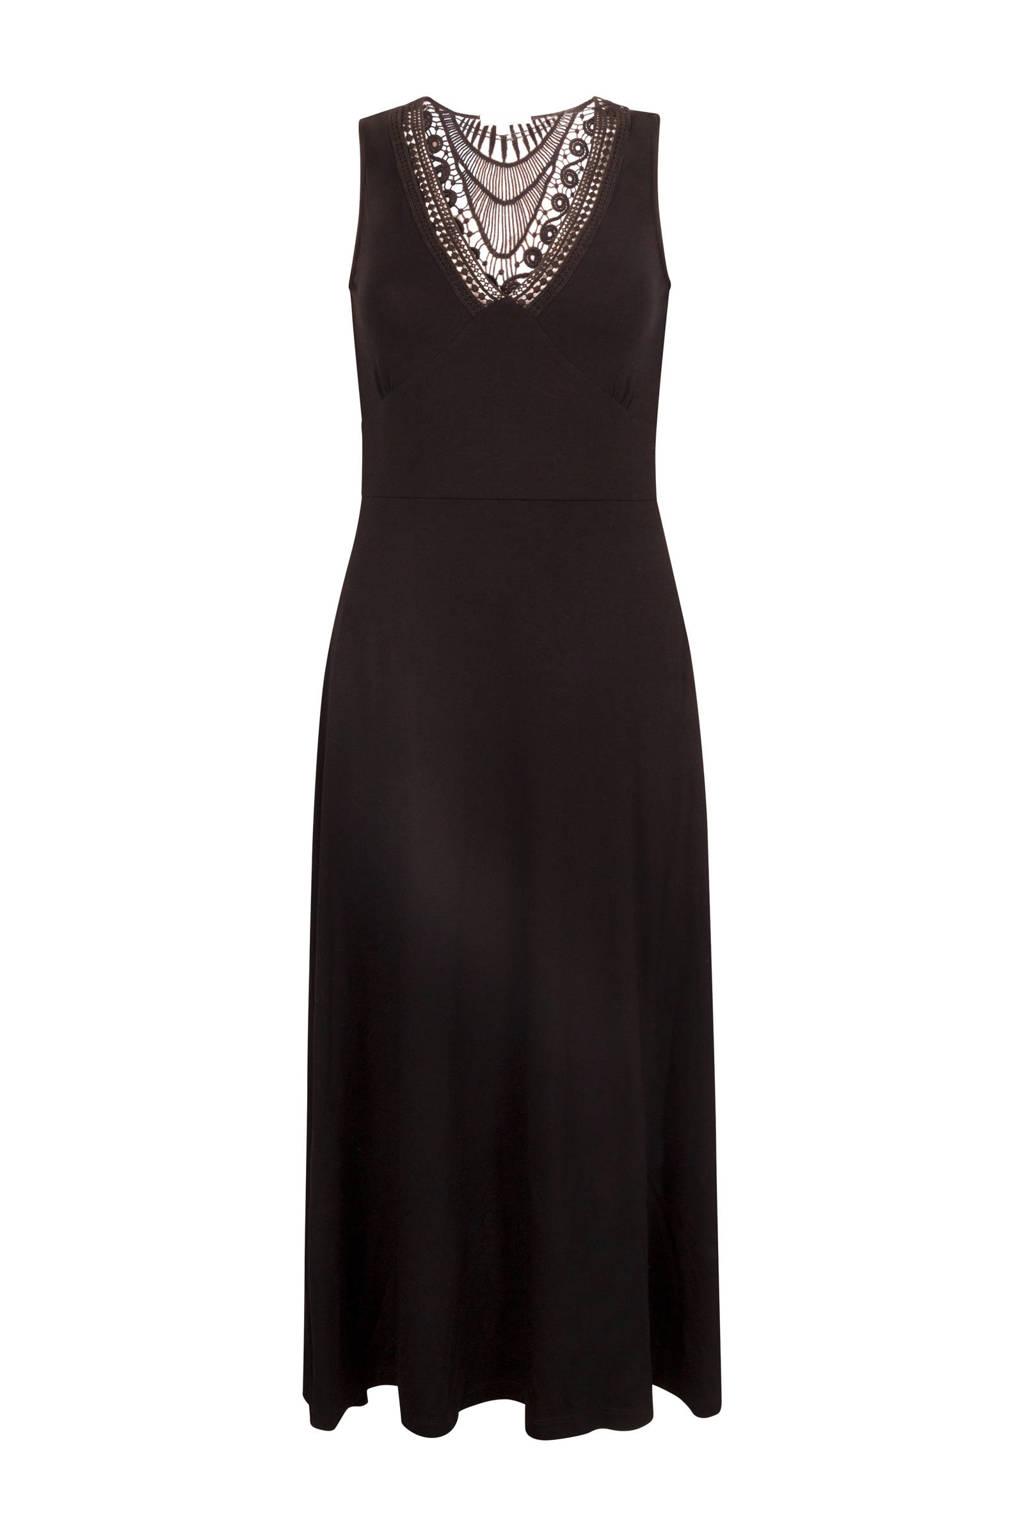 Tramontana jurk zwart, Zwart